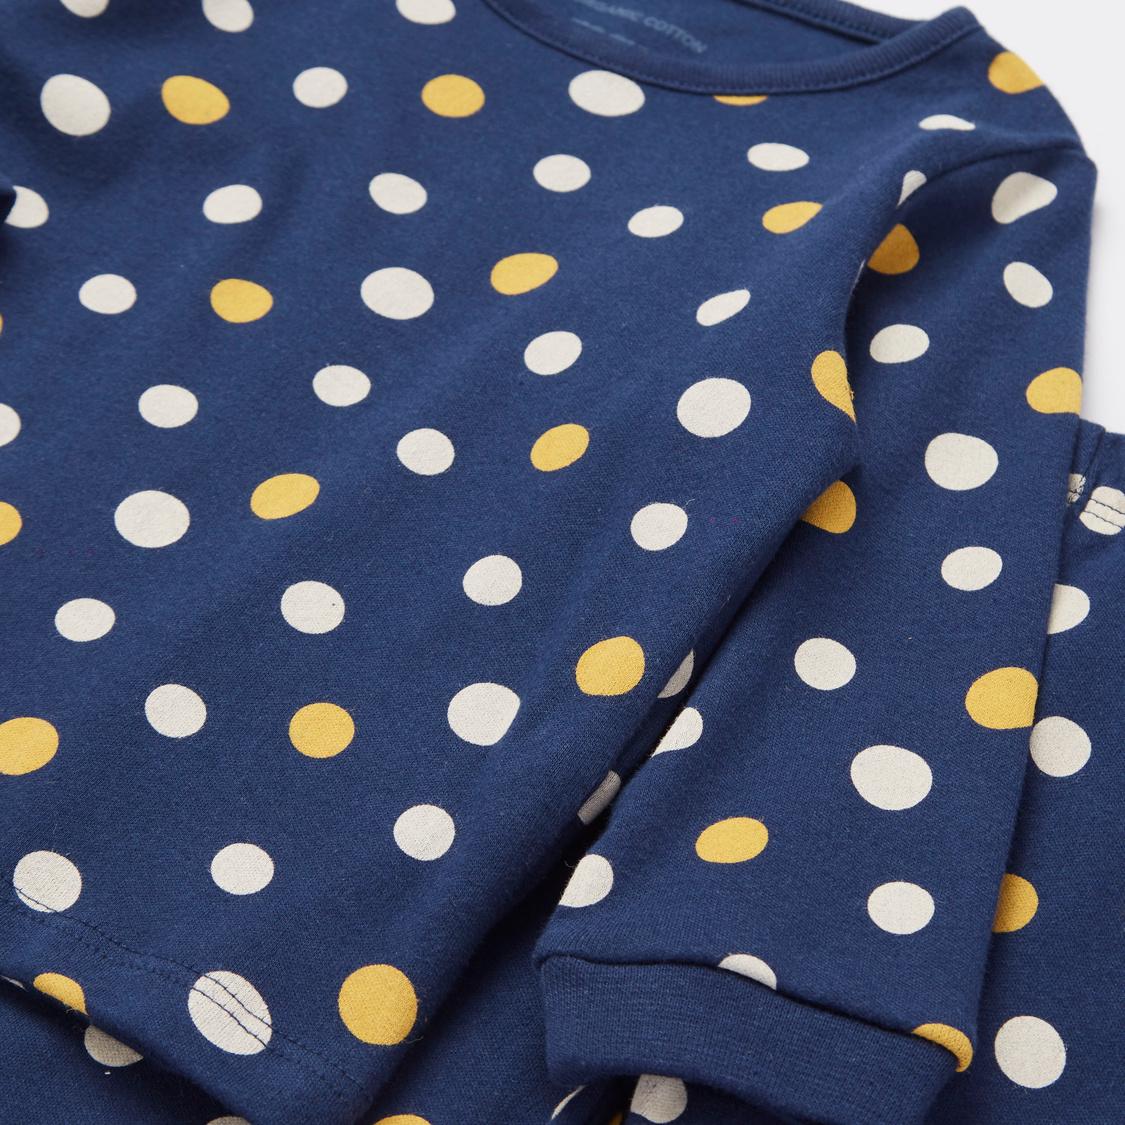 Polka Dot Print Long Sleeves T-shirt and Pyjama Set